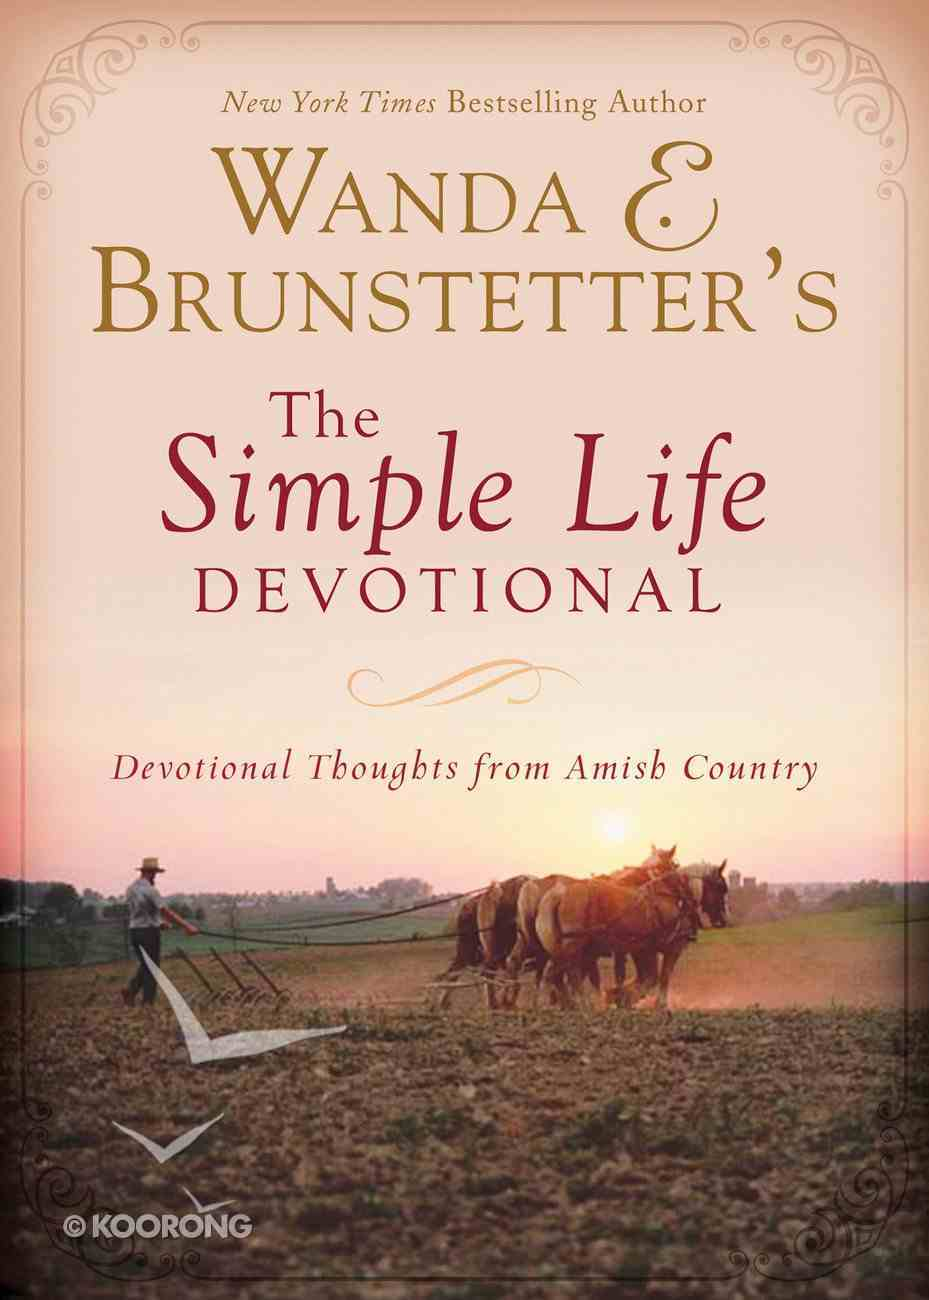 Wanda E. Brunstetter's the Simple Life Devotional eBook